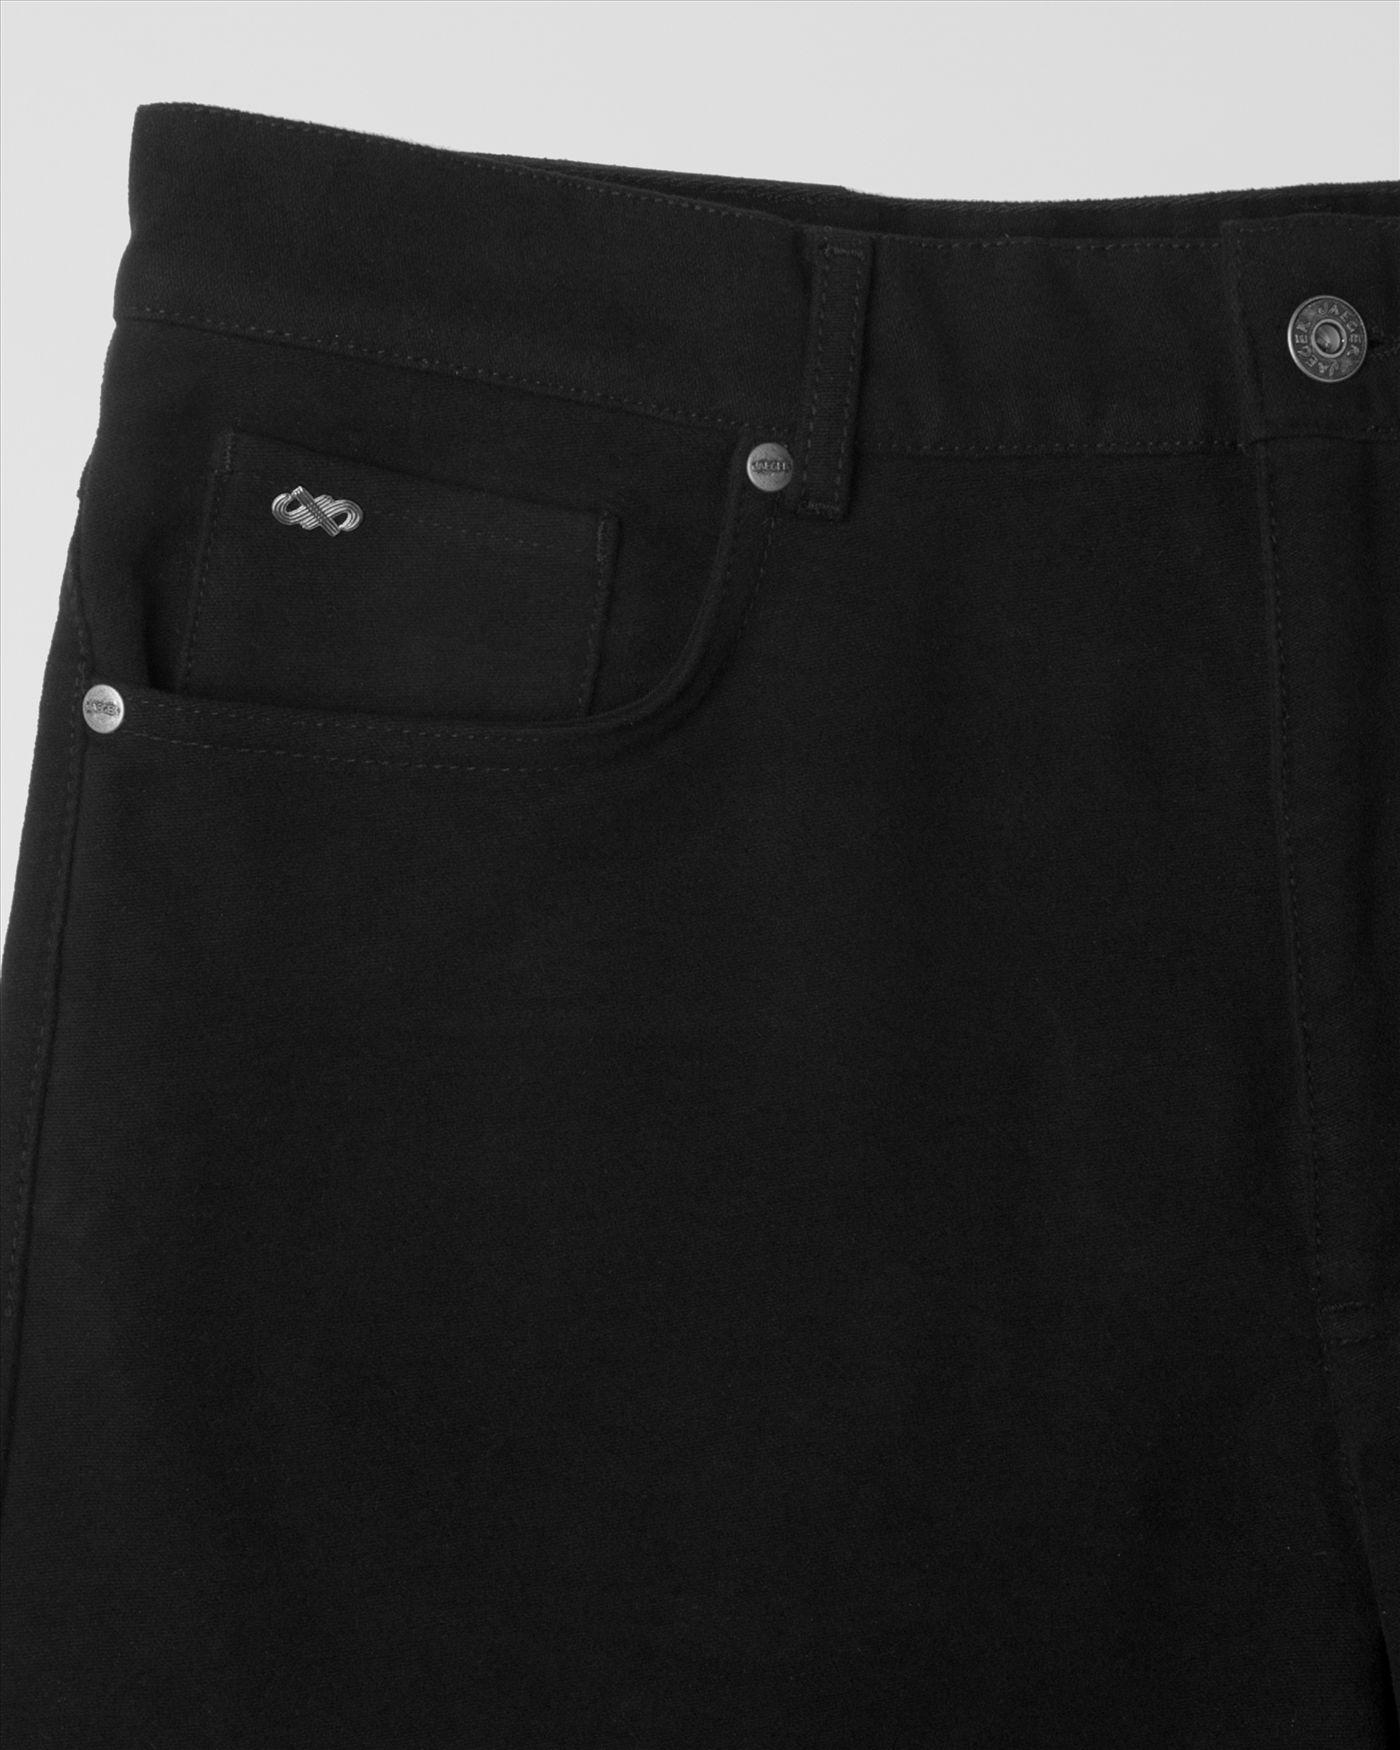 black single men in berwick Styleedition: berwick1707 | berwick 3520-boxcale-negro single monk strap leather shoes - purchase now to accumulate reedemable points | rakuten global market.